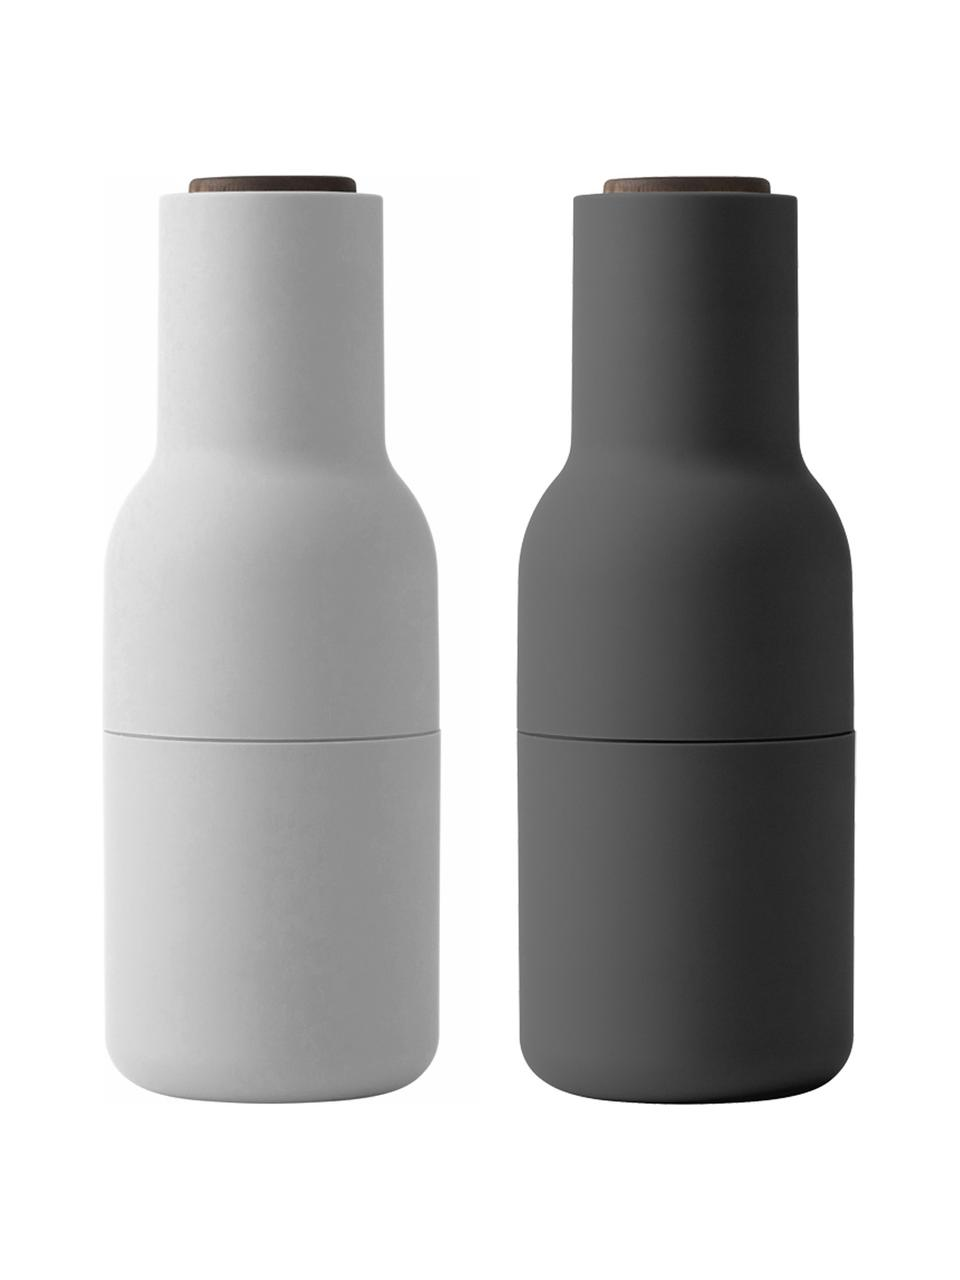 Set saliera e pepiera di design Grinder 2 pz, Coperchio: legno di noce, Antracite, bianco, Ø 8 x Alt. 21 cm